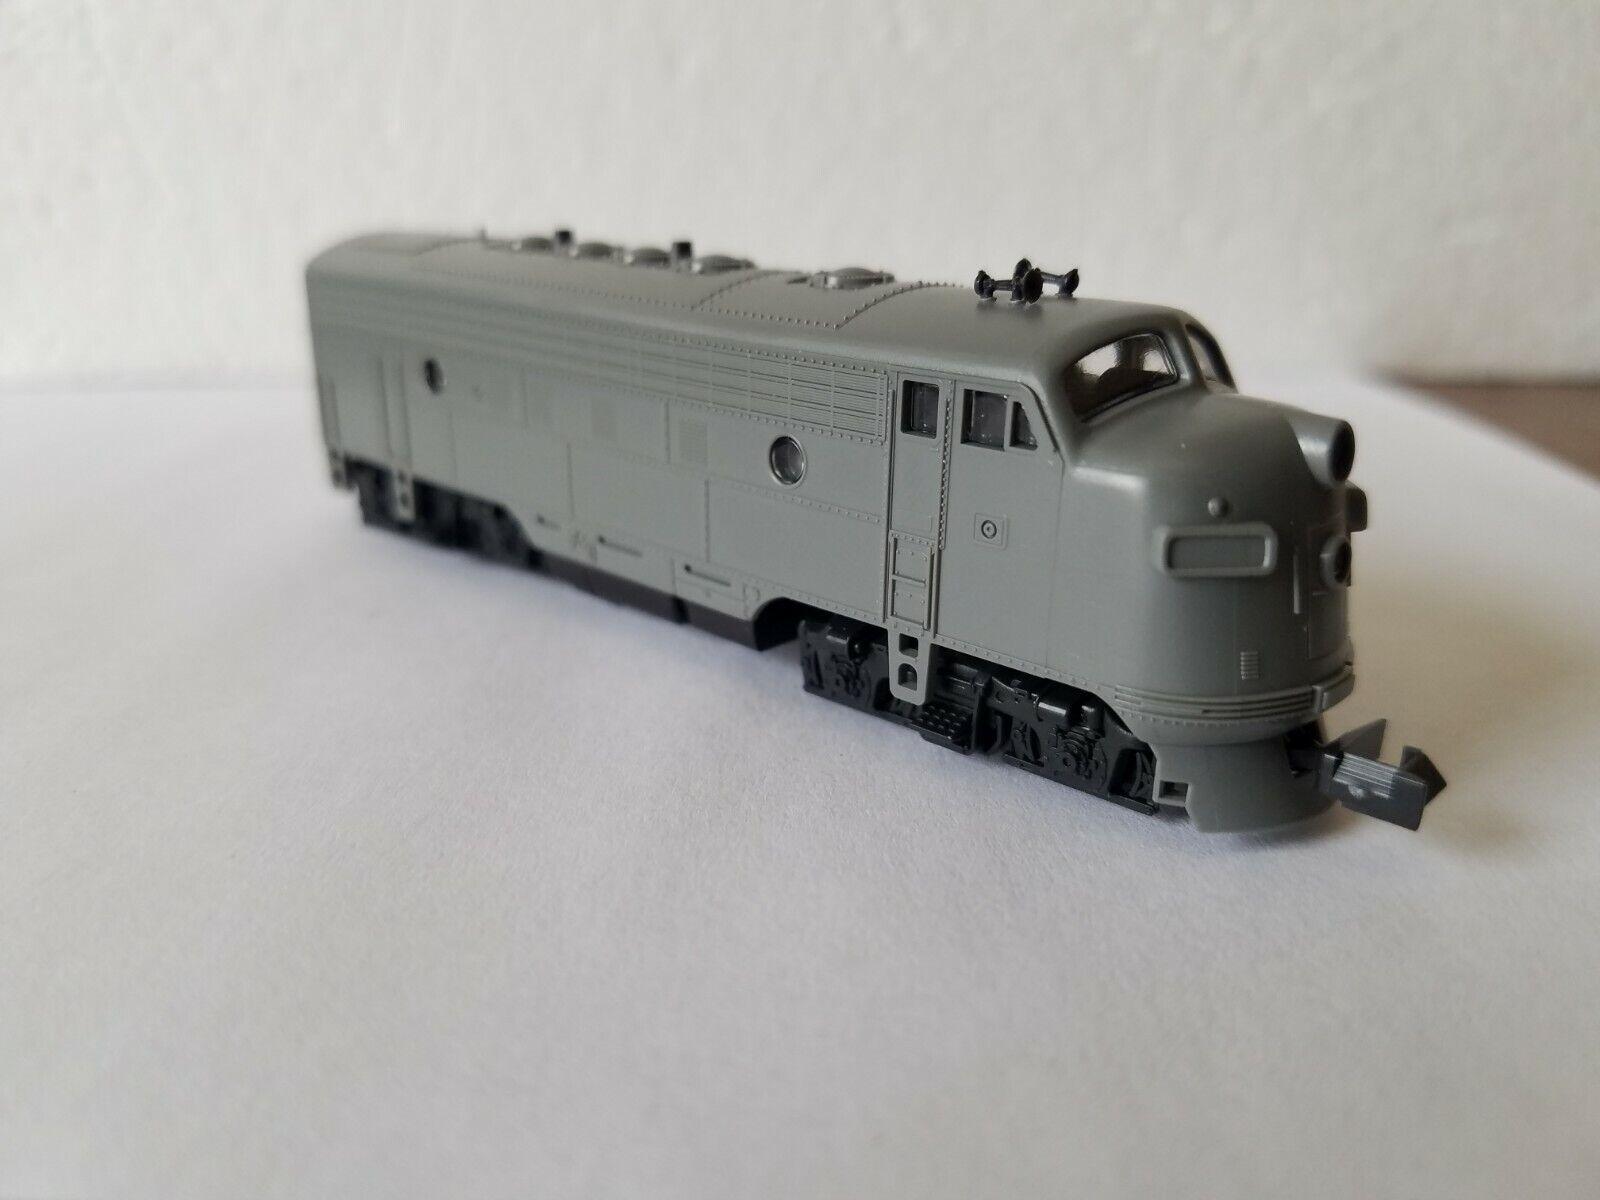 N Scale NIB Kato F7A Locomotive Undecorated Dual Headlight Headlight Headlight Item 5bc641